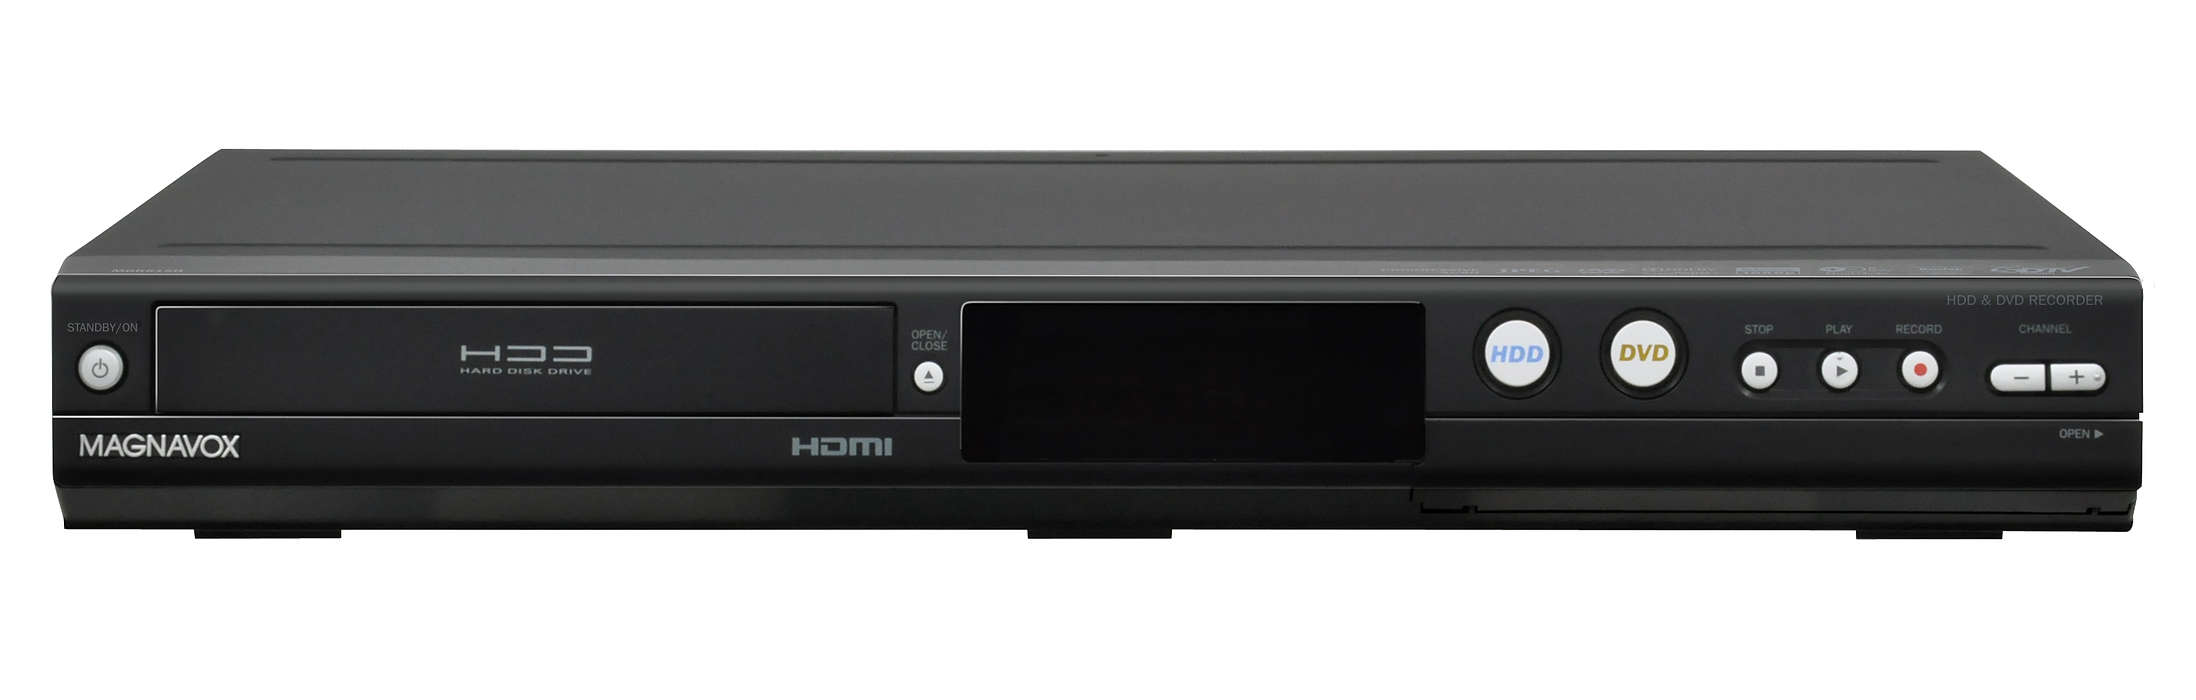 500GB HDD & DVD Recorder